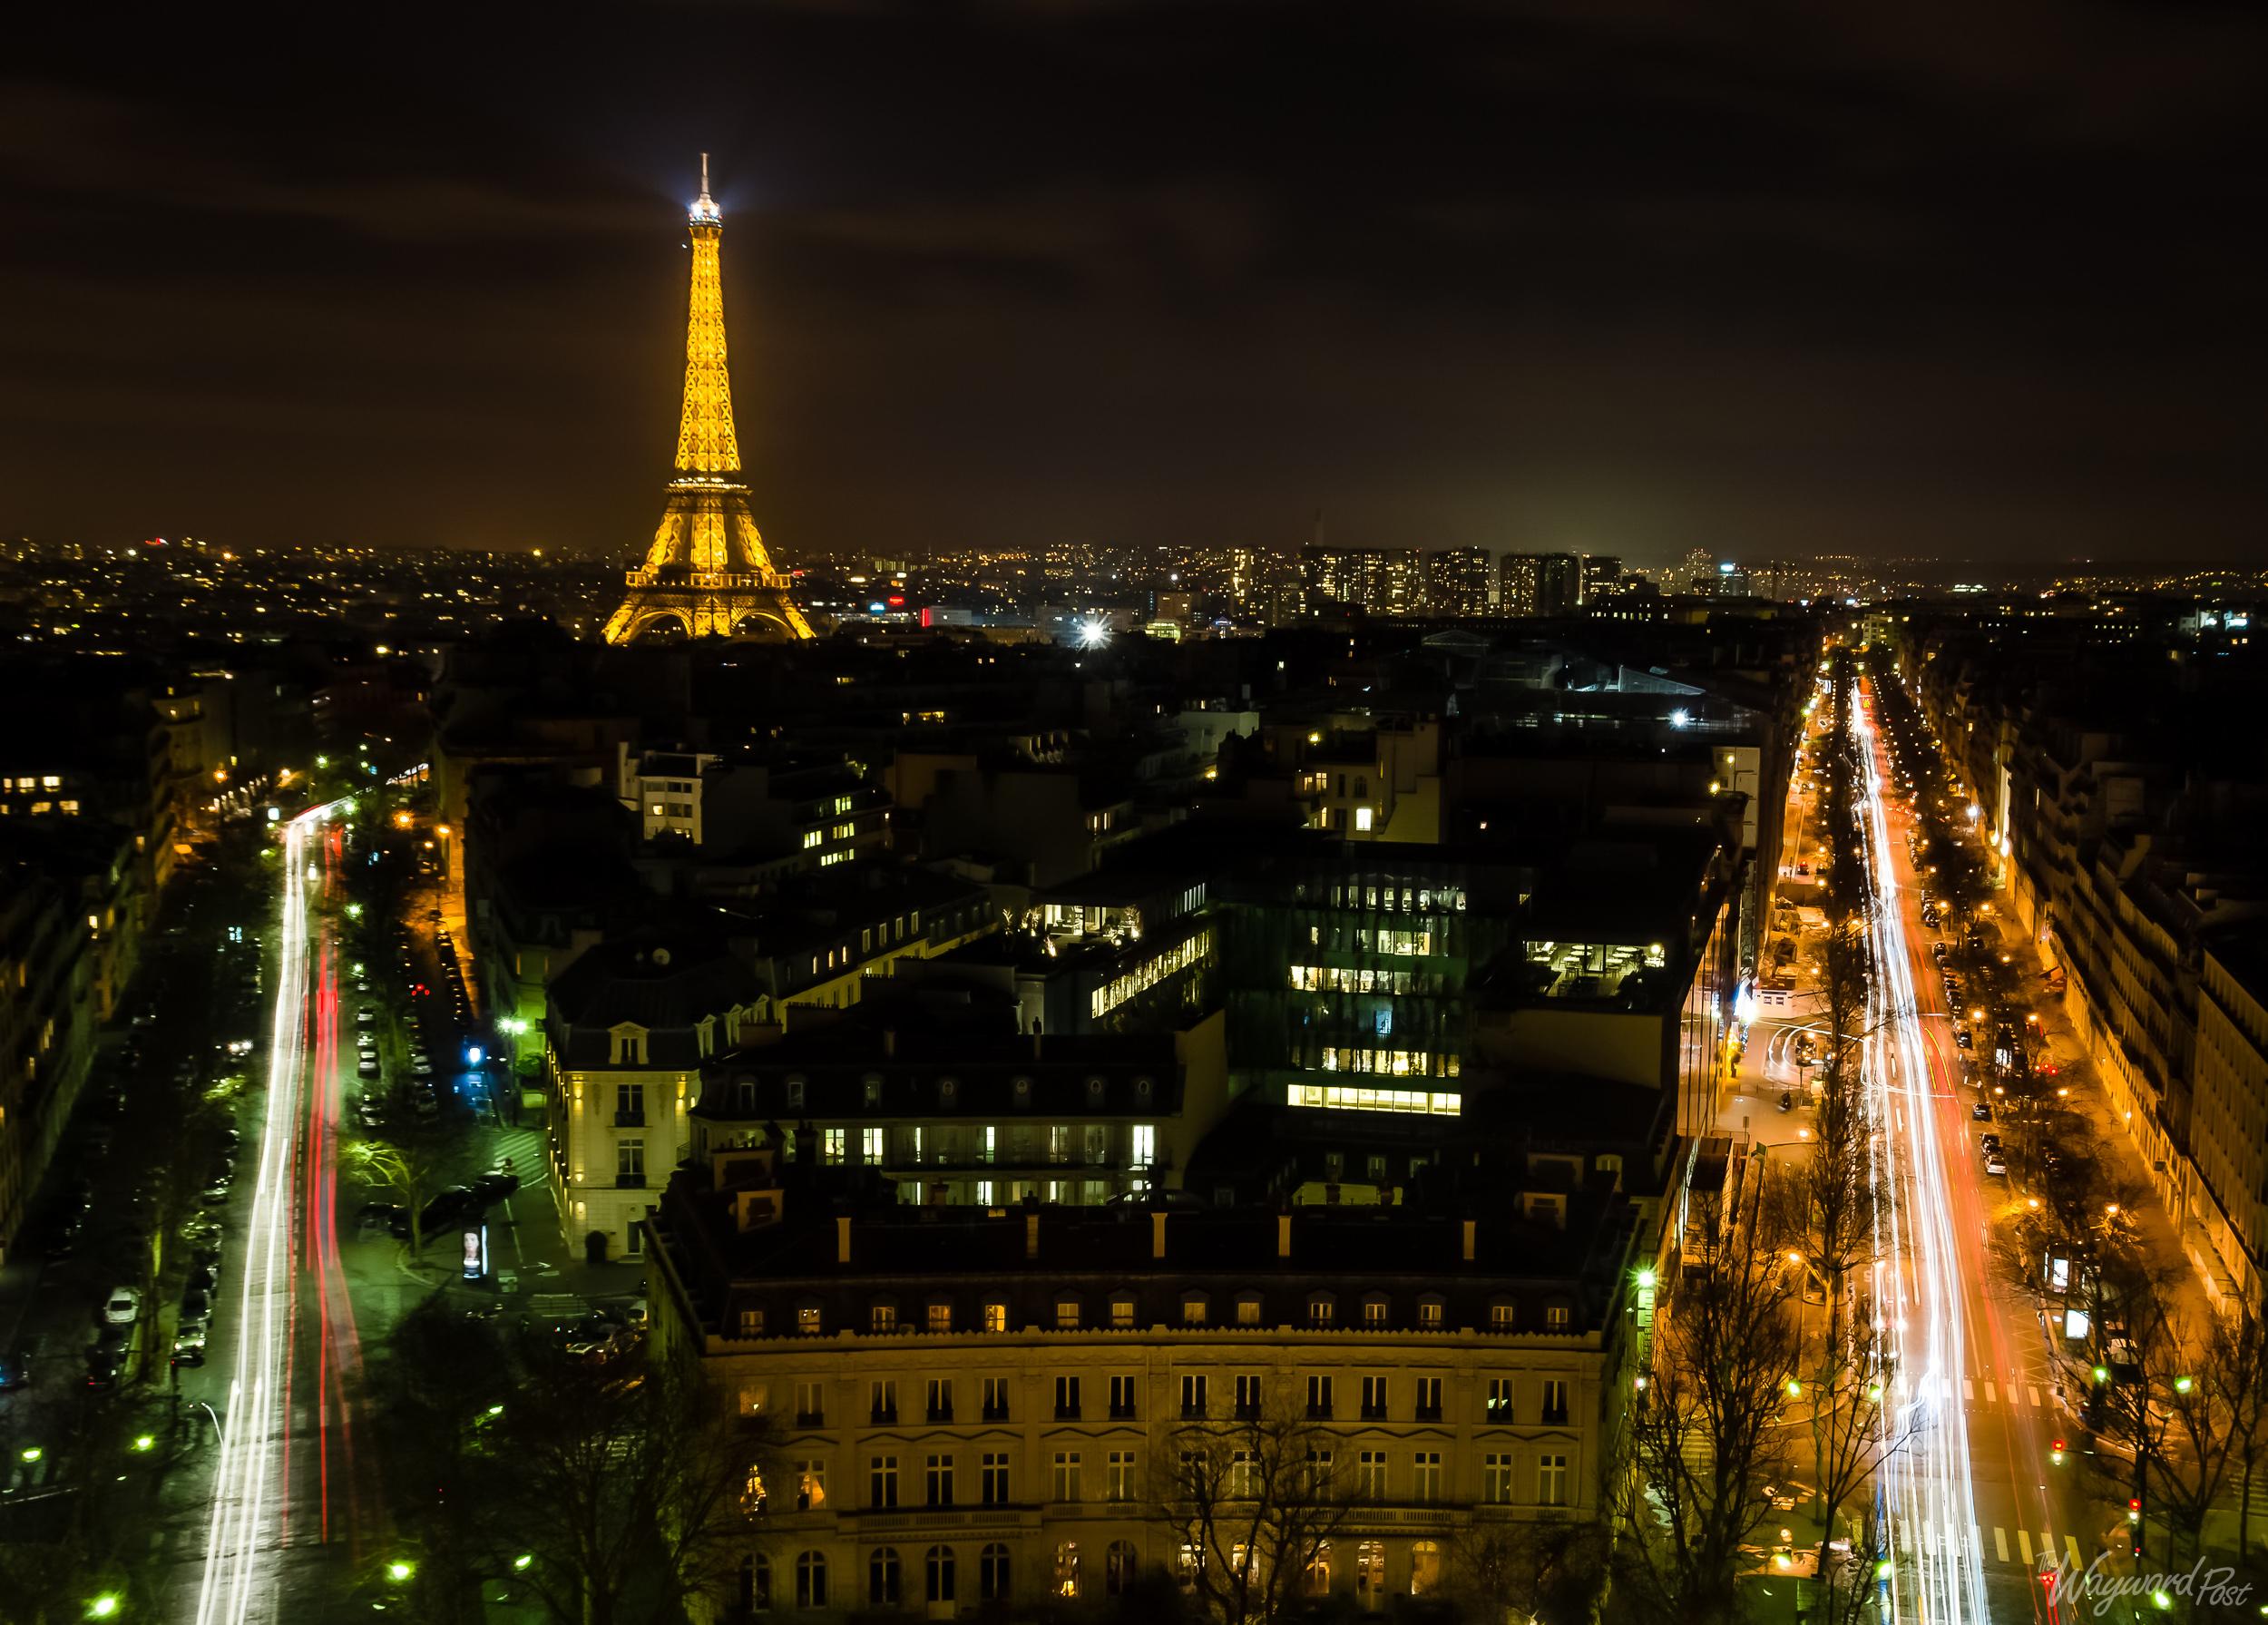 Eiffel Tower,Arc De Triomphe, Paris, France, The Wayward Post